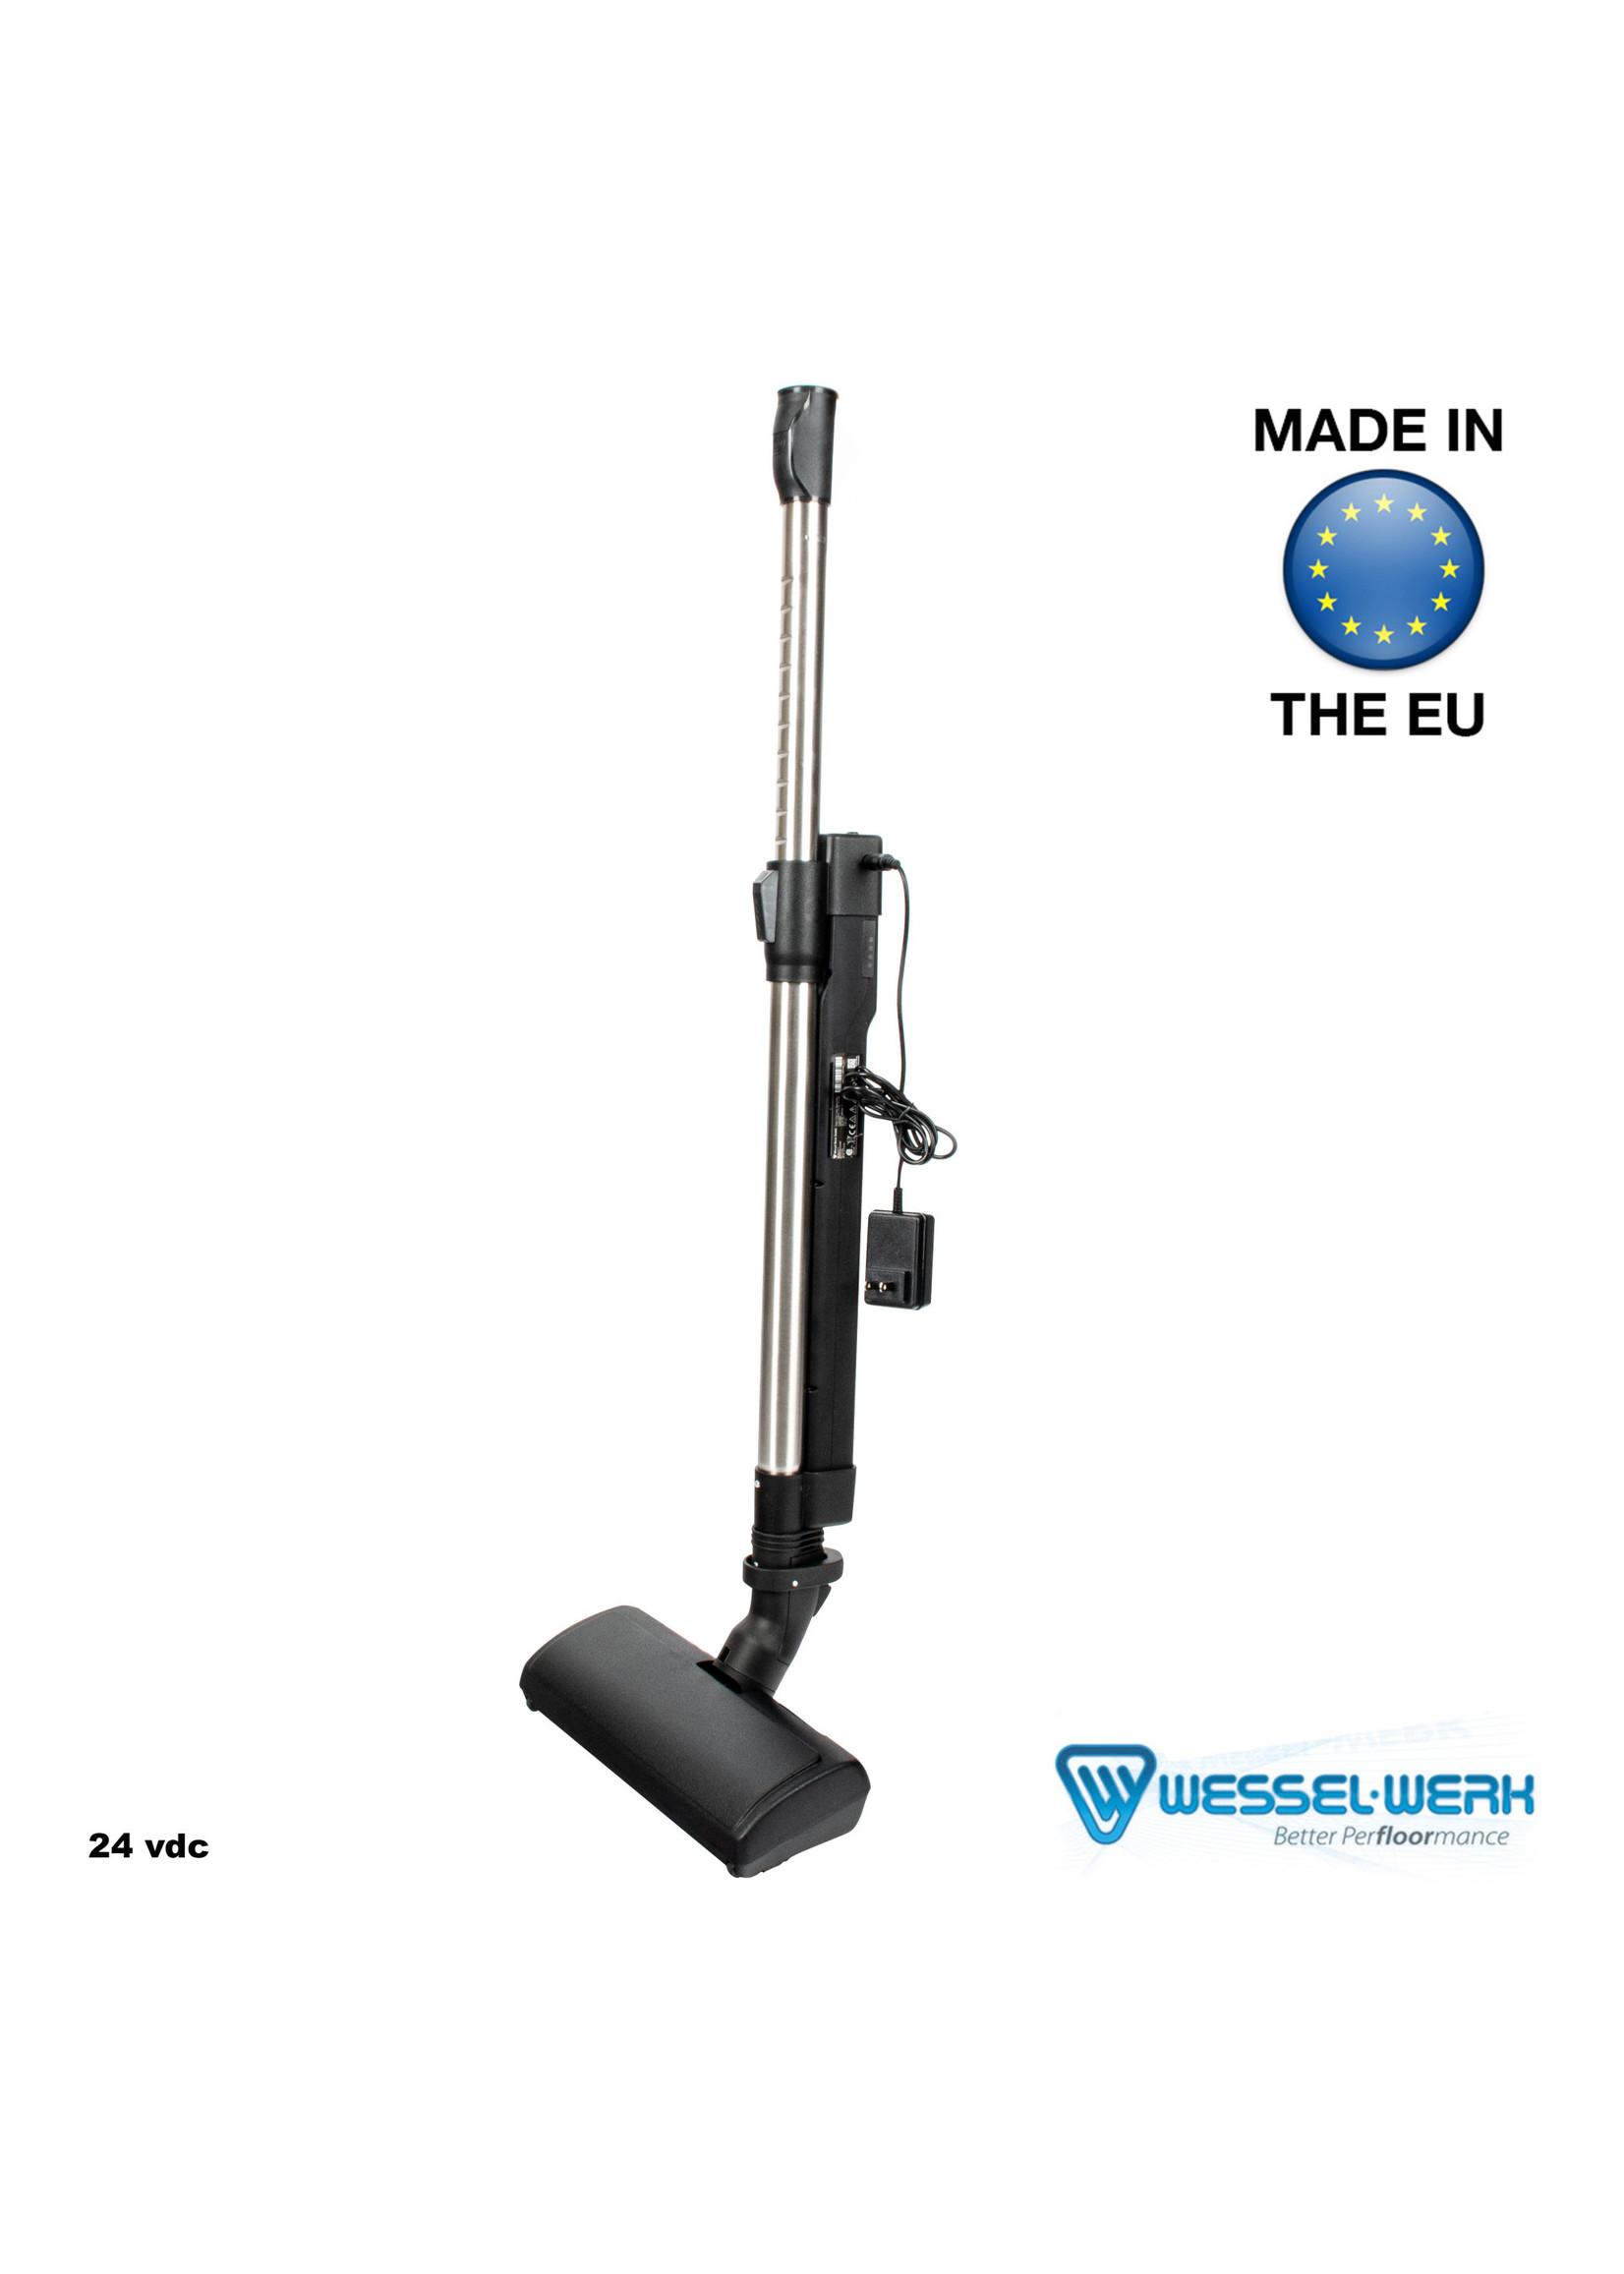 Wessel Werk Wessel Werk EBK280 DC Battery Powered Brush w/ wand